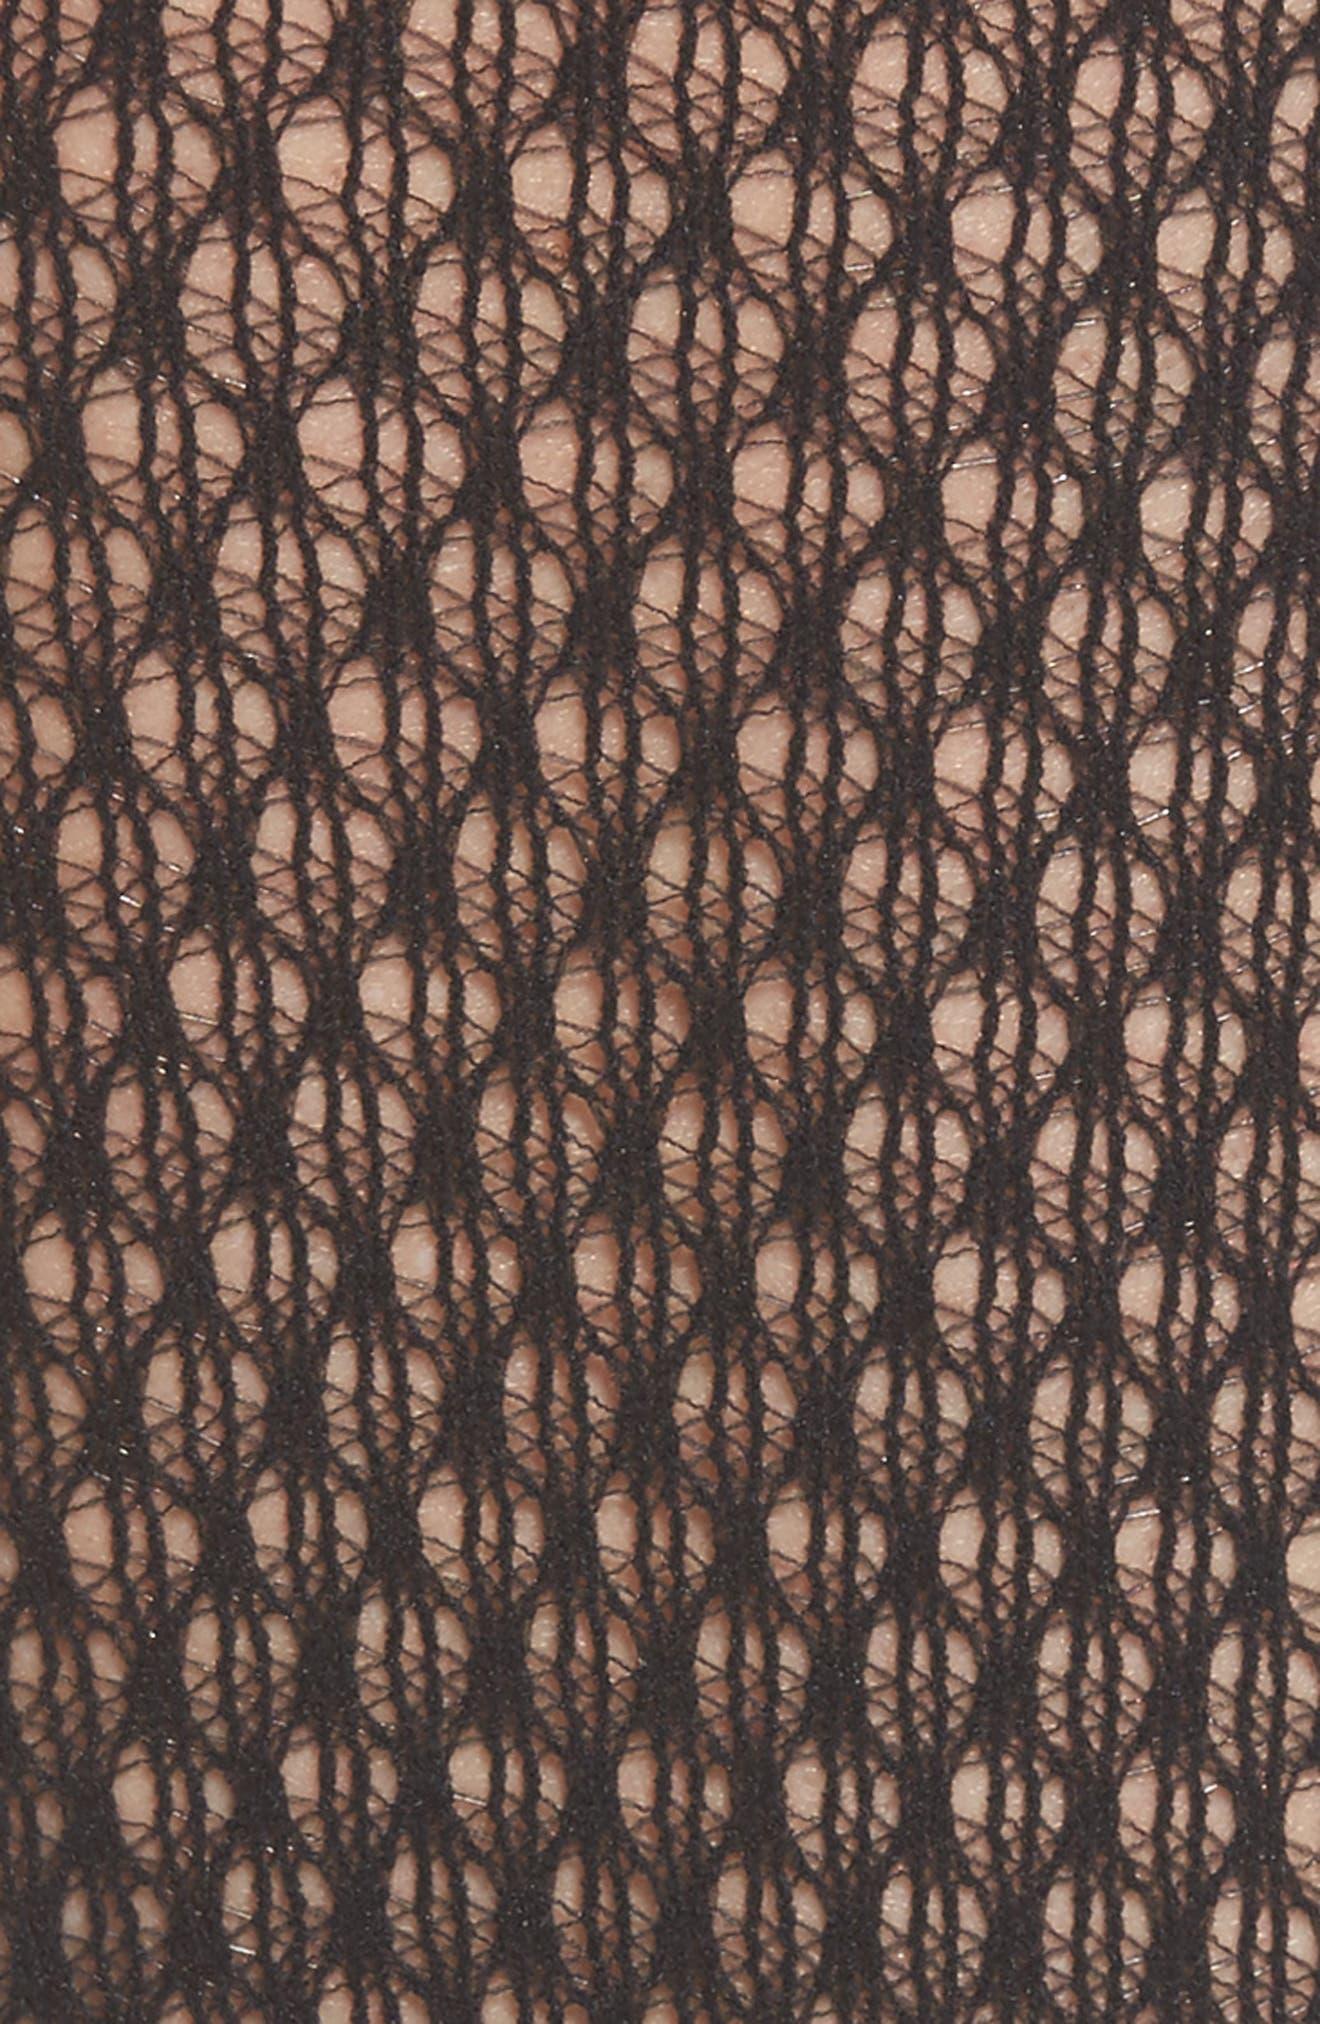 Rhomb Net Knee High Stockings,                             Alternate thumbnail 3, color,